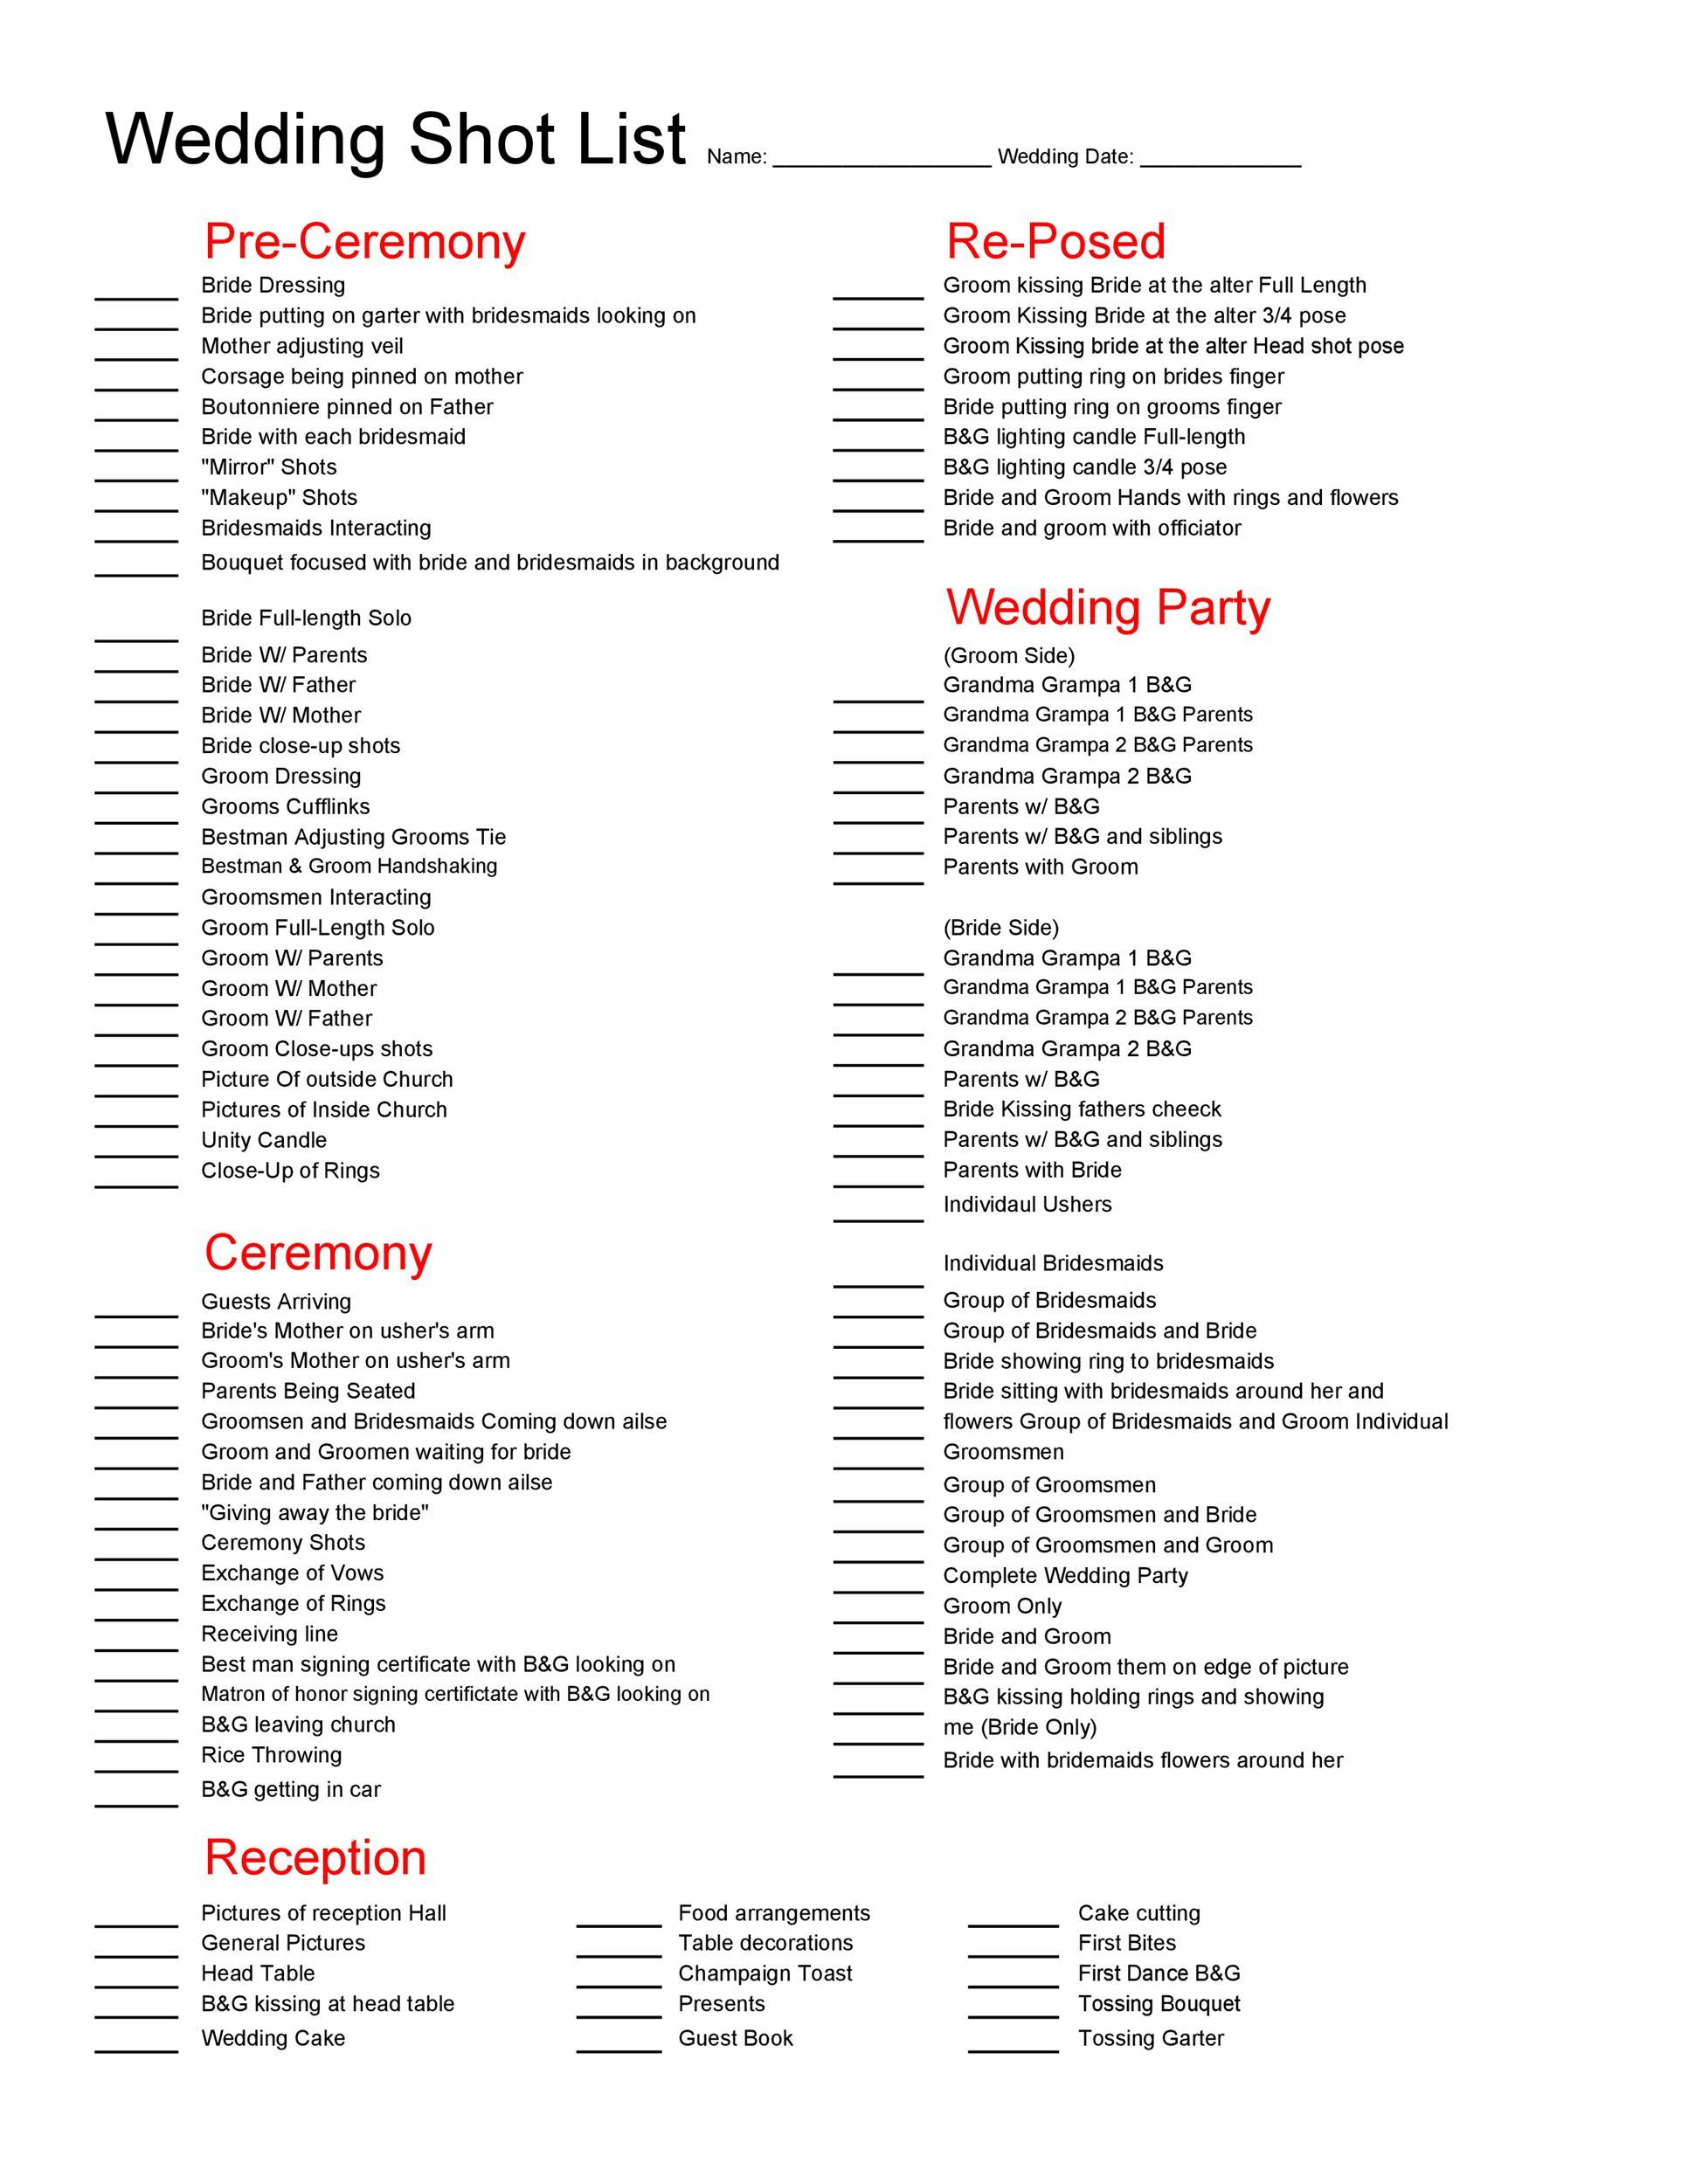 Free shot list template 05